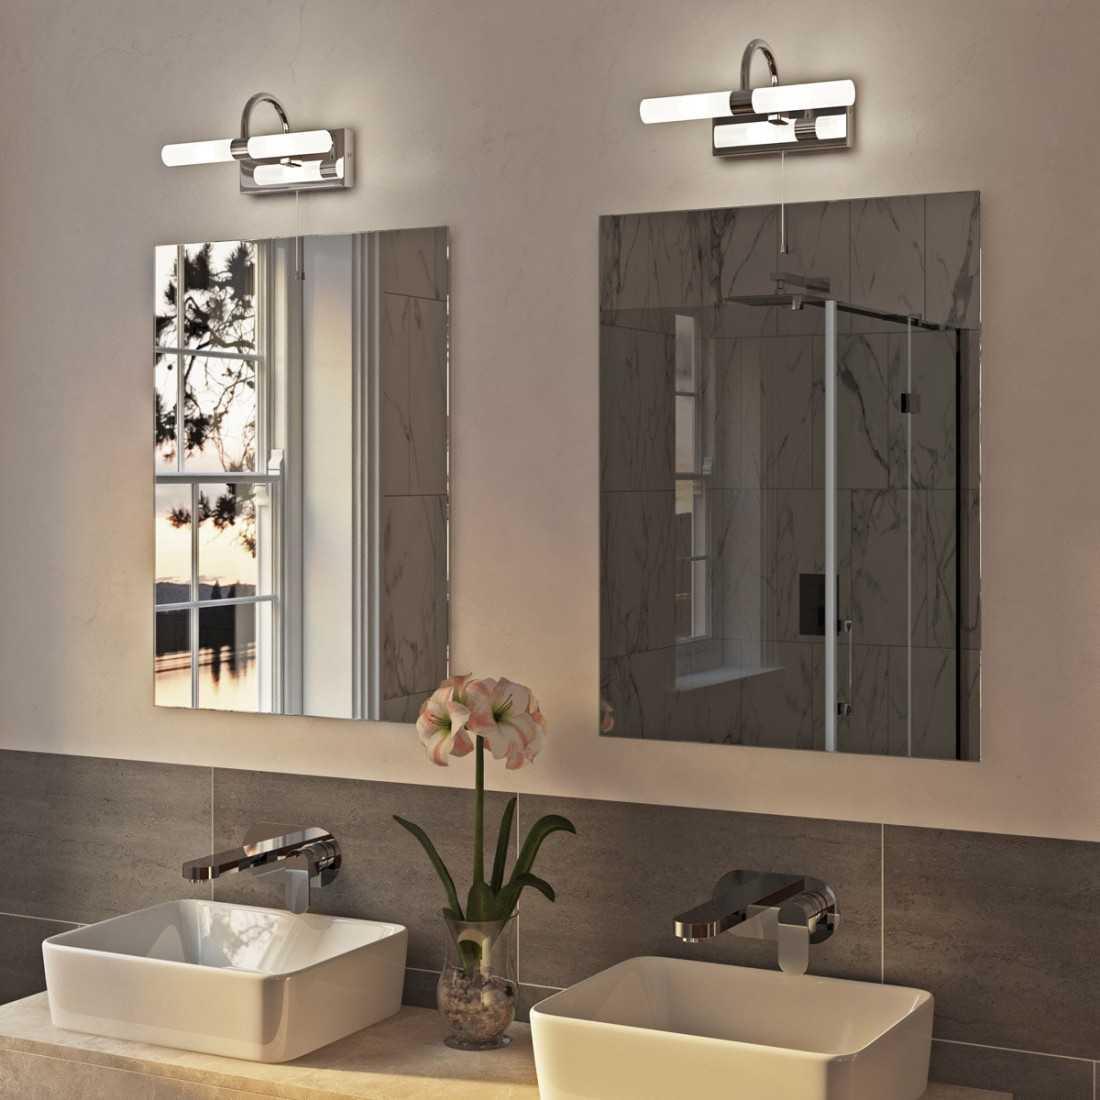 Light over mirror in bathroom